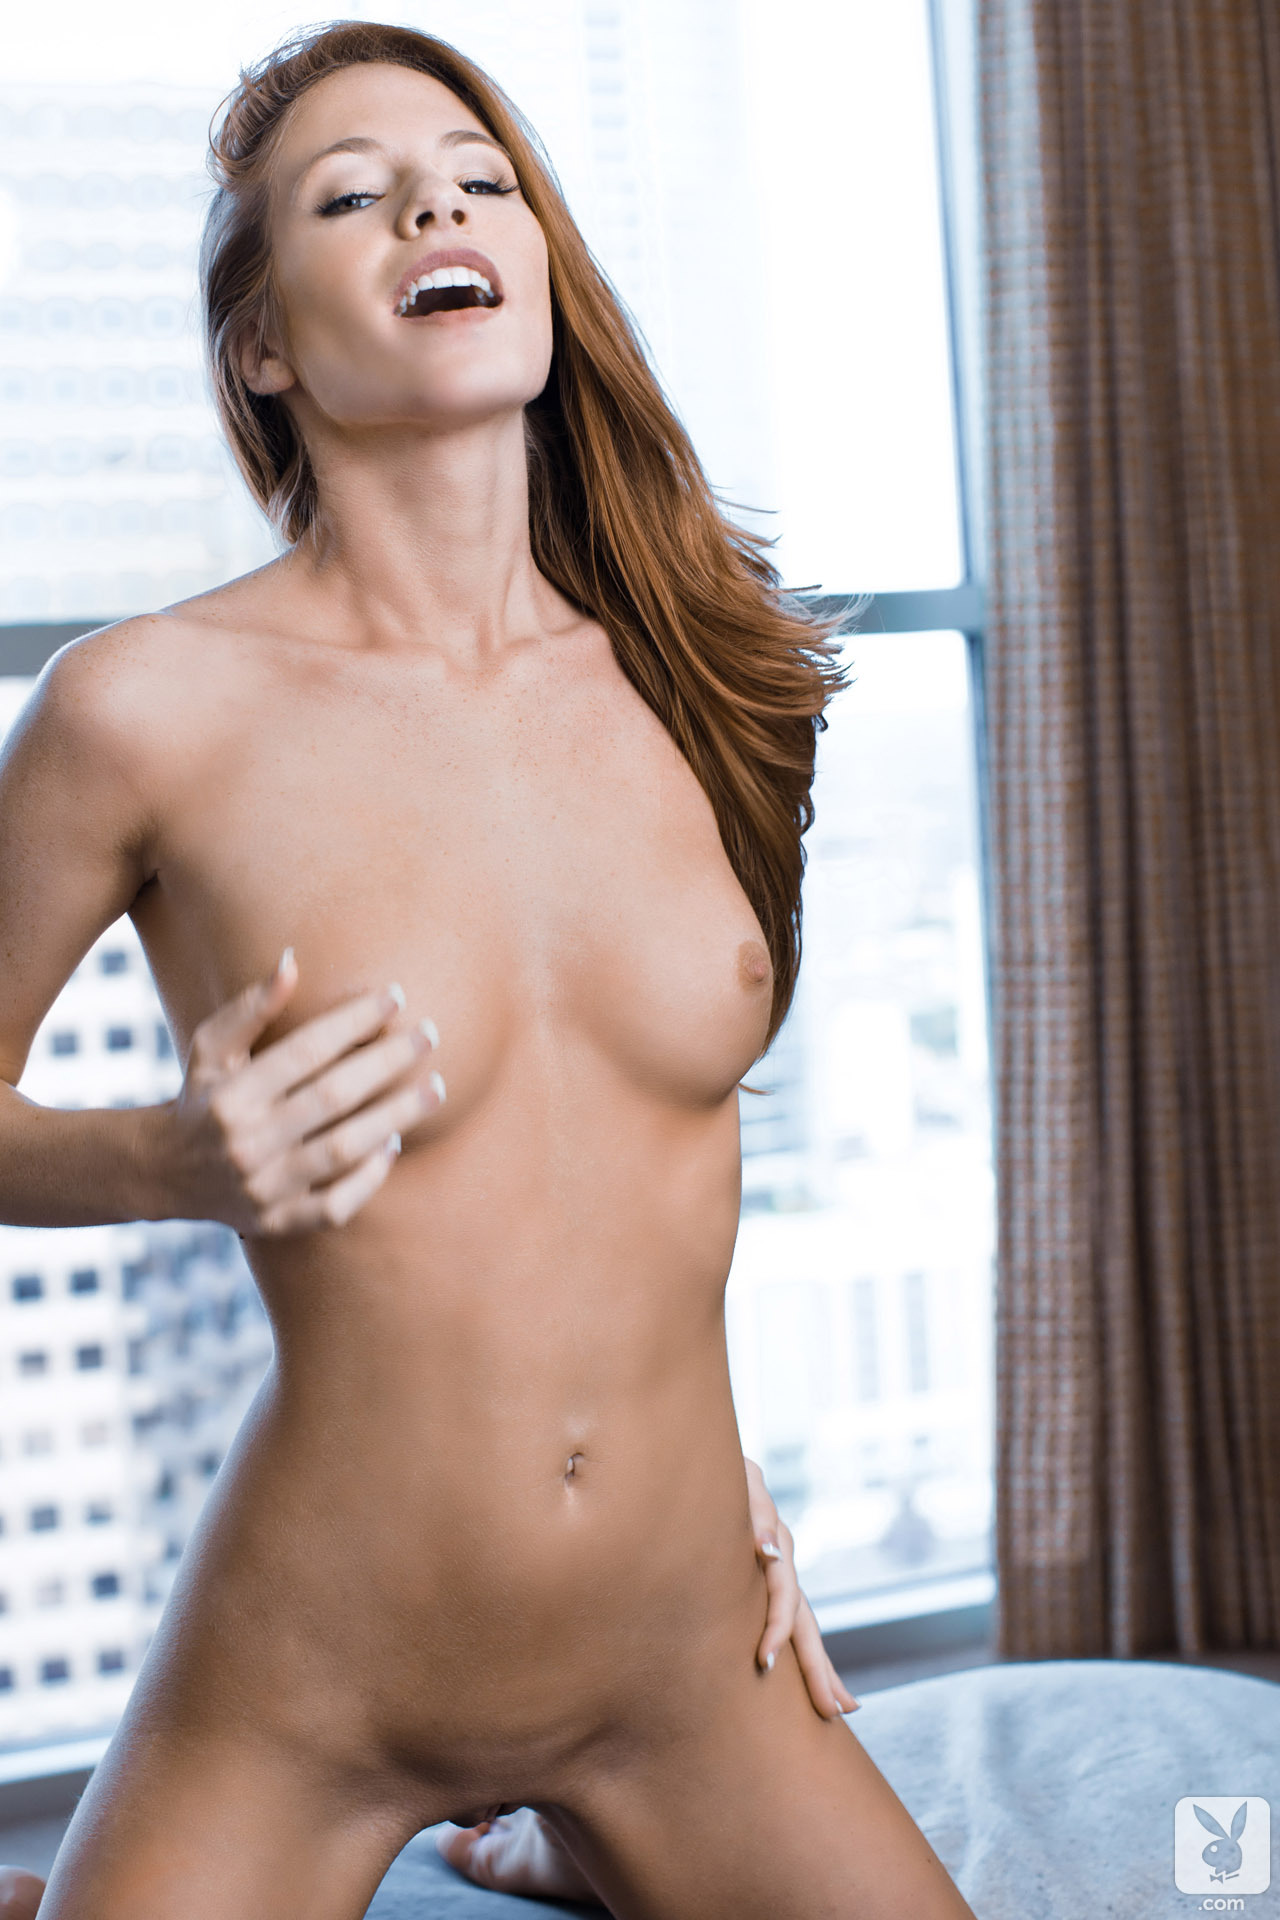 bree-morgan-nude-apartment-redhead-playboy-14